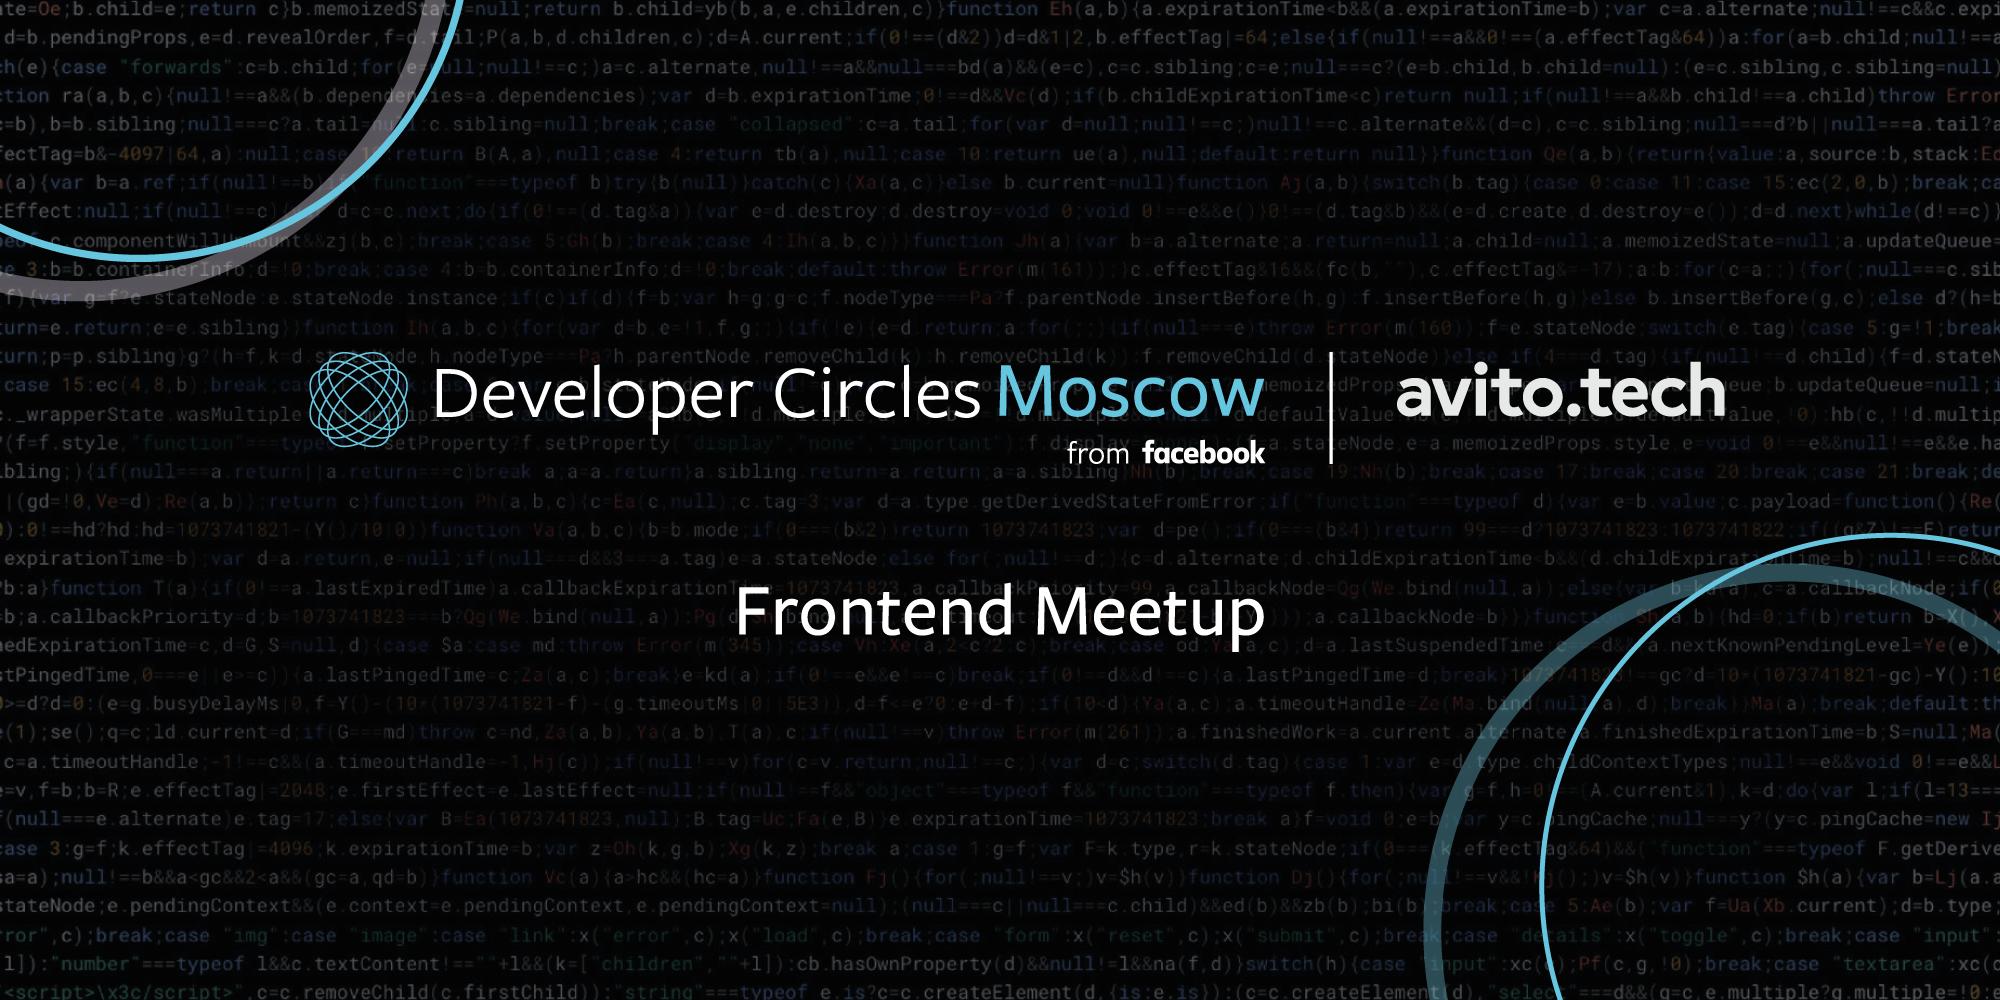 Фронтенд митап Facebook и AvitoTech - 1